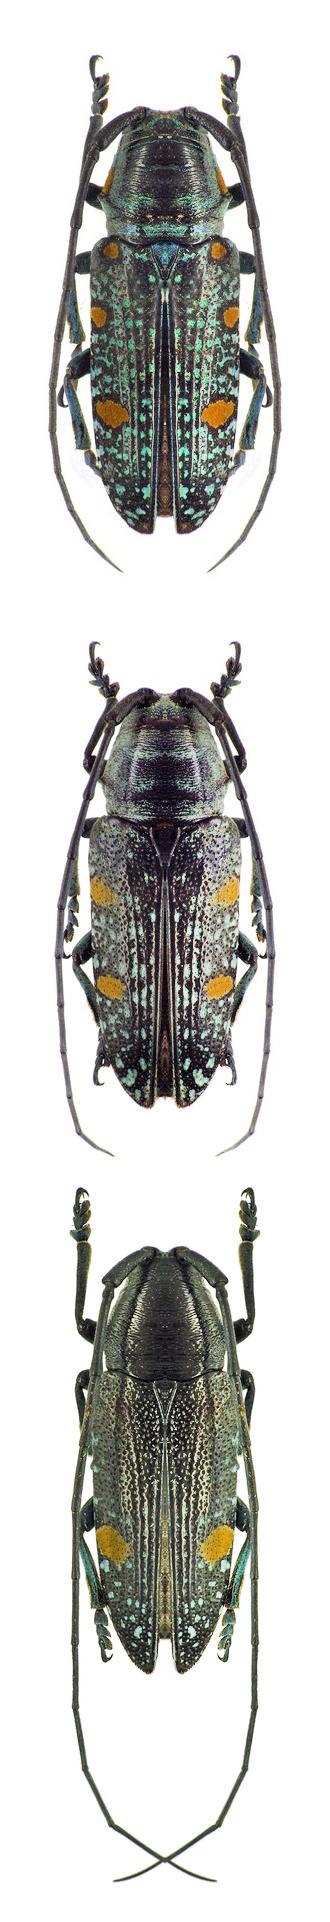 Pinacosterna nachtigali trimaculata;  Pinacosterna nachtigali smithi;  Pinacosterna nachtigali uniocellata